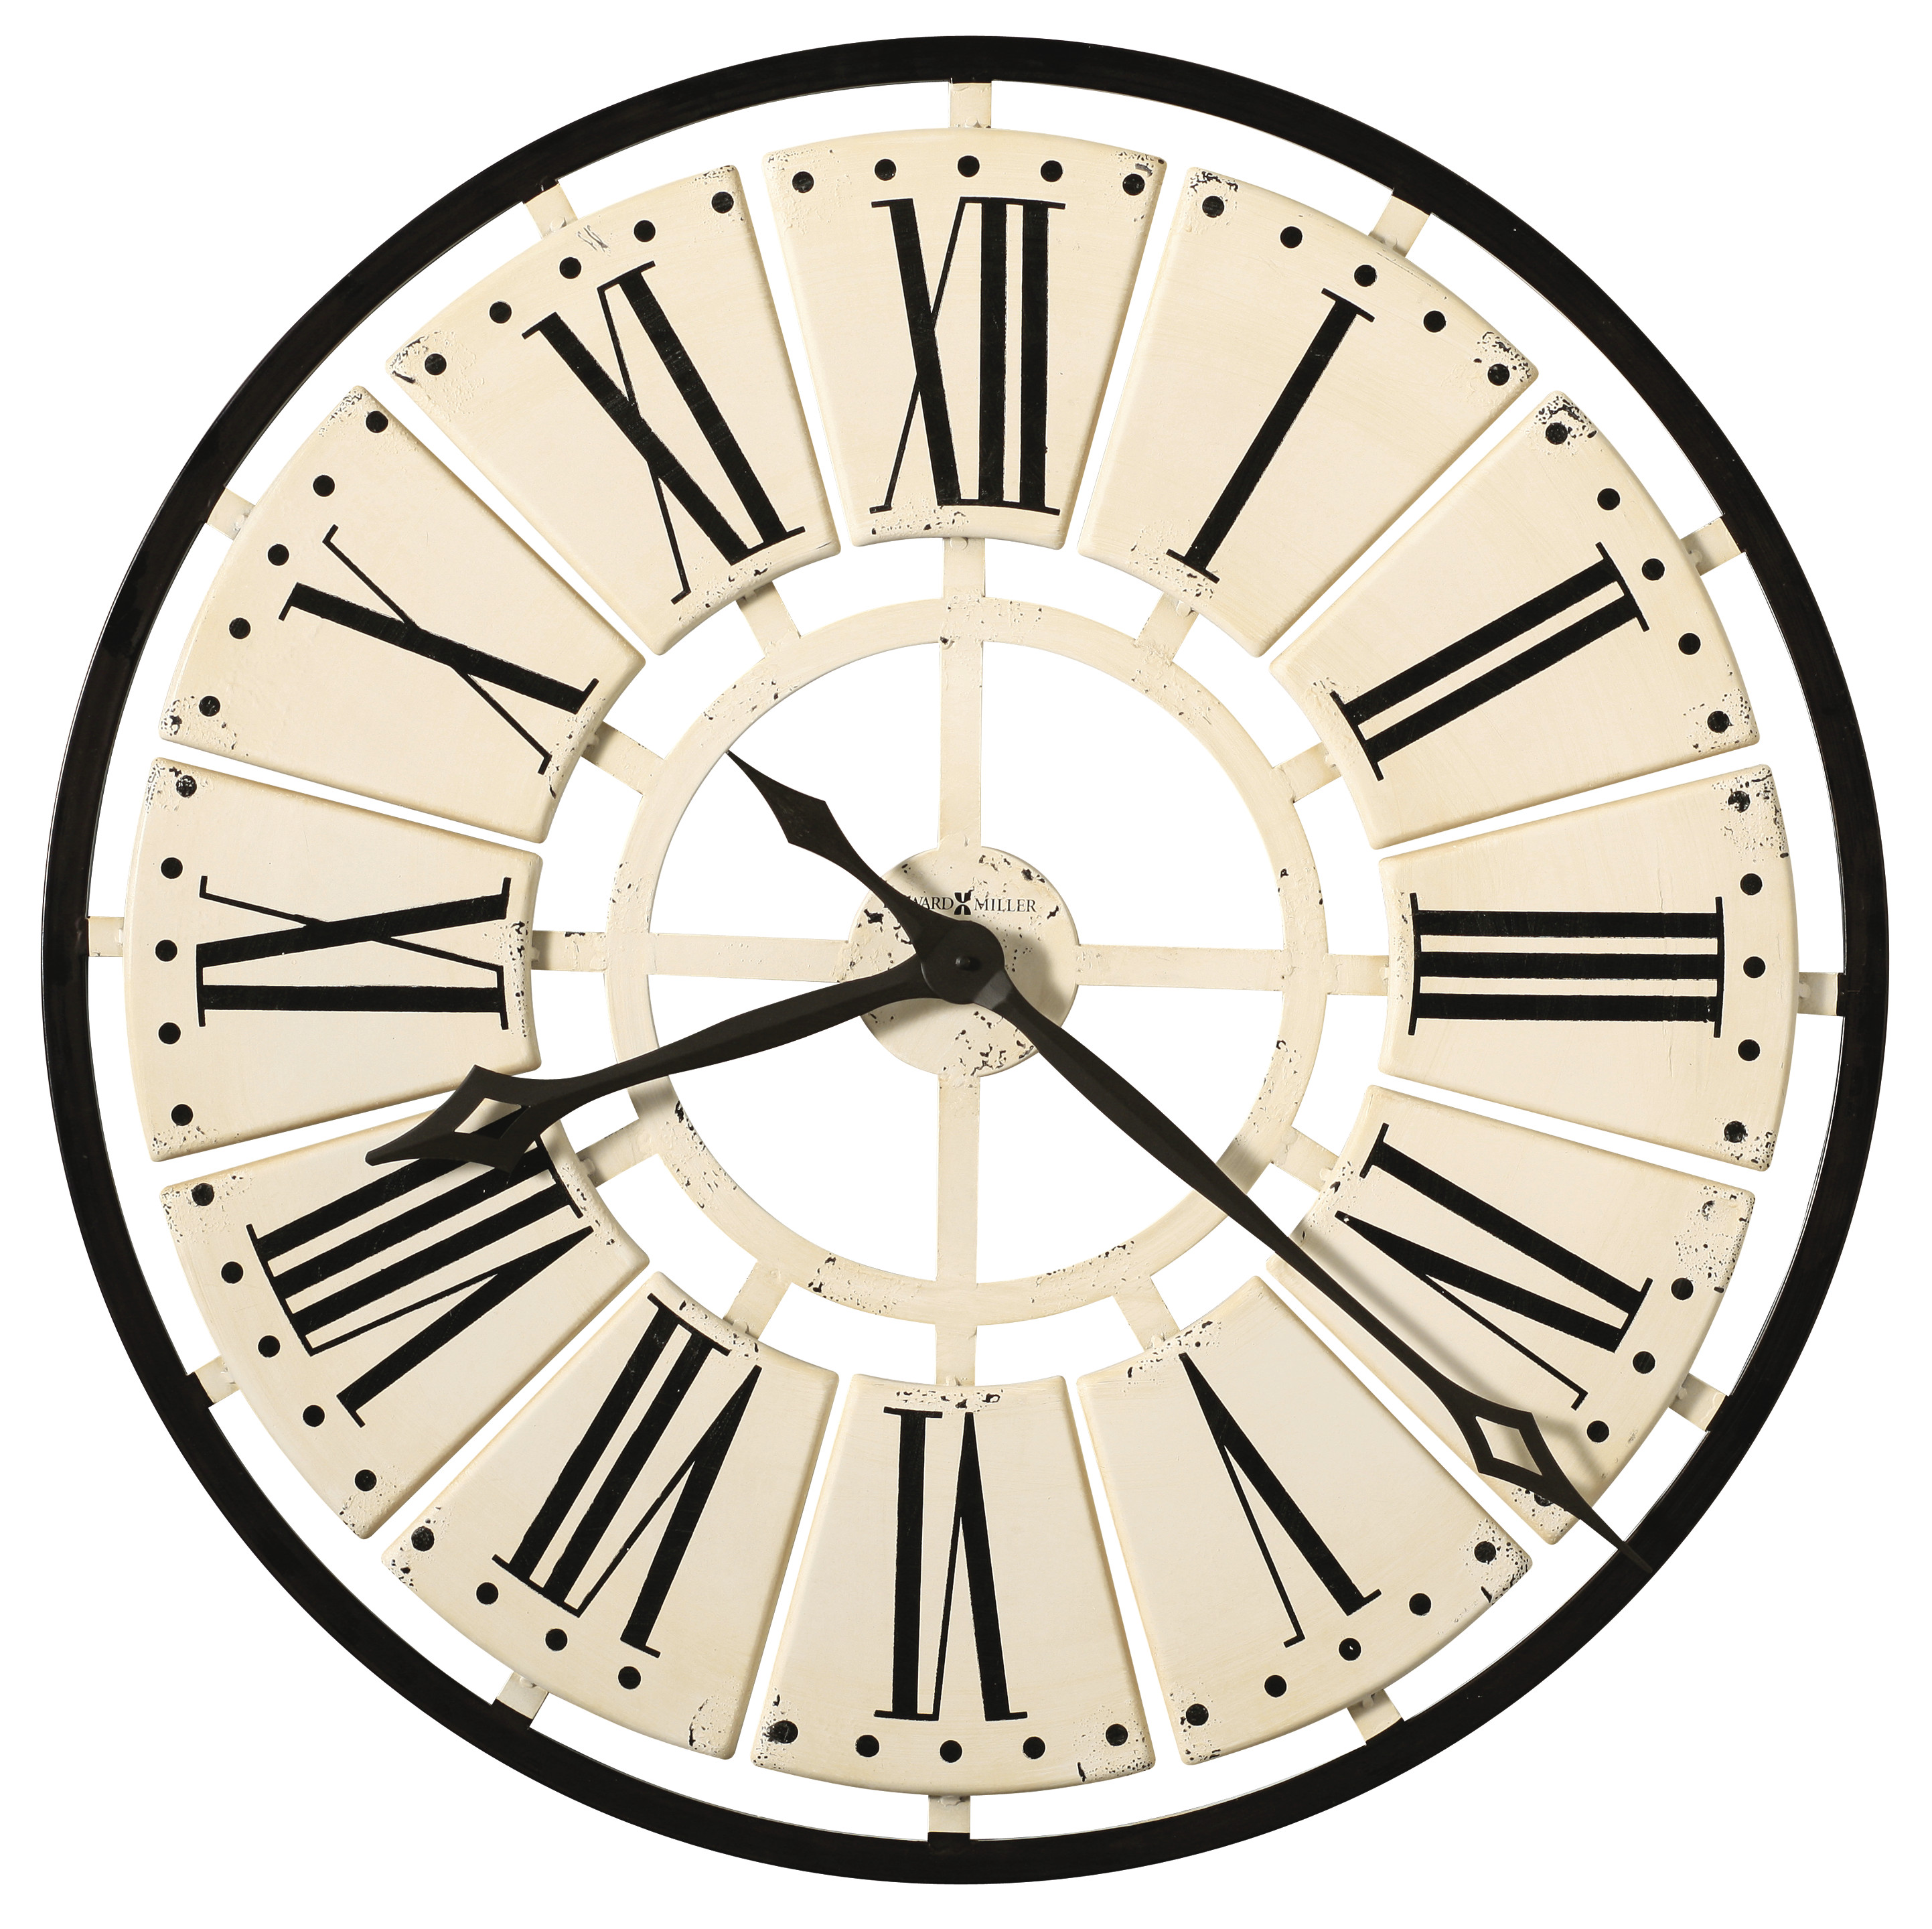 Pierre 315 House Of Clocks